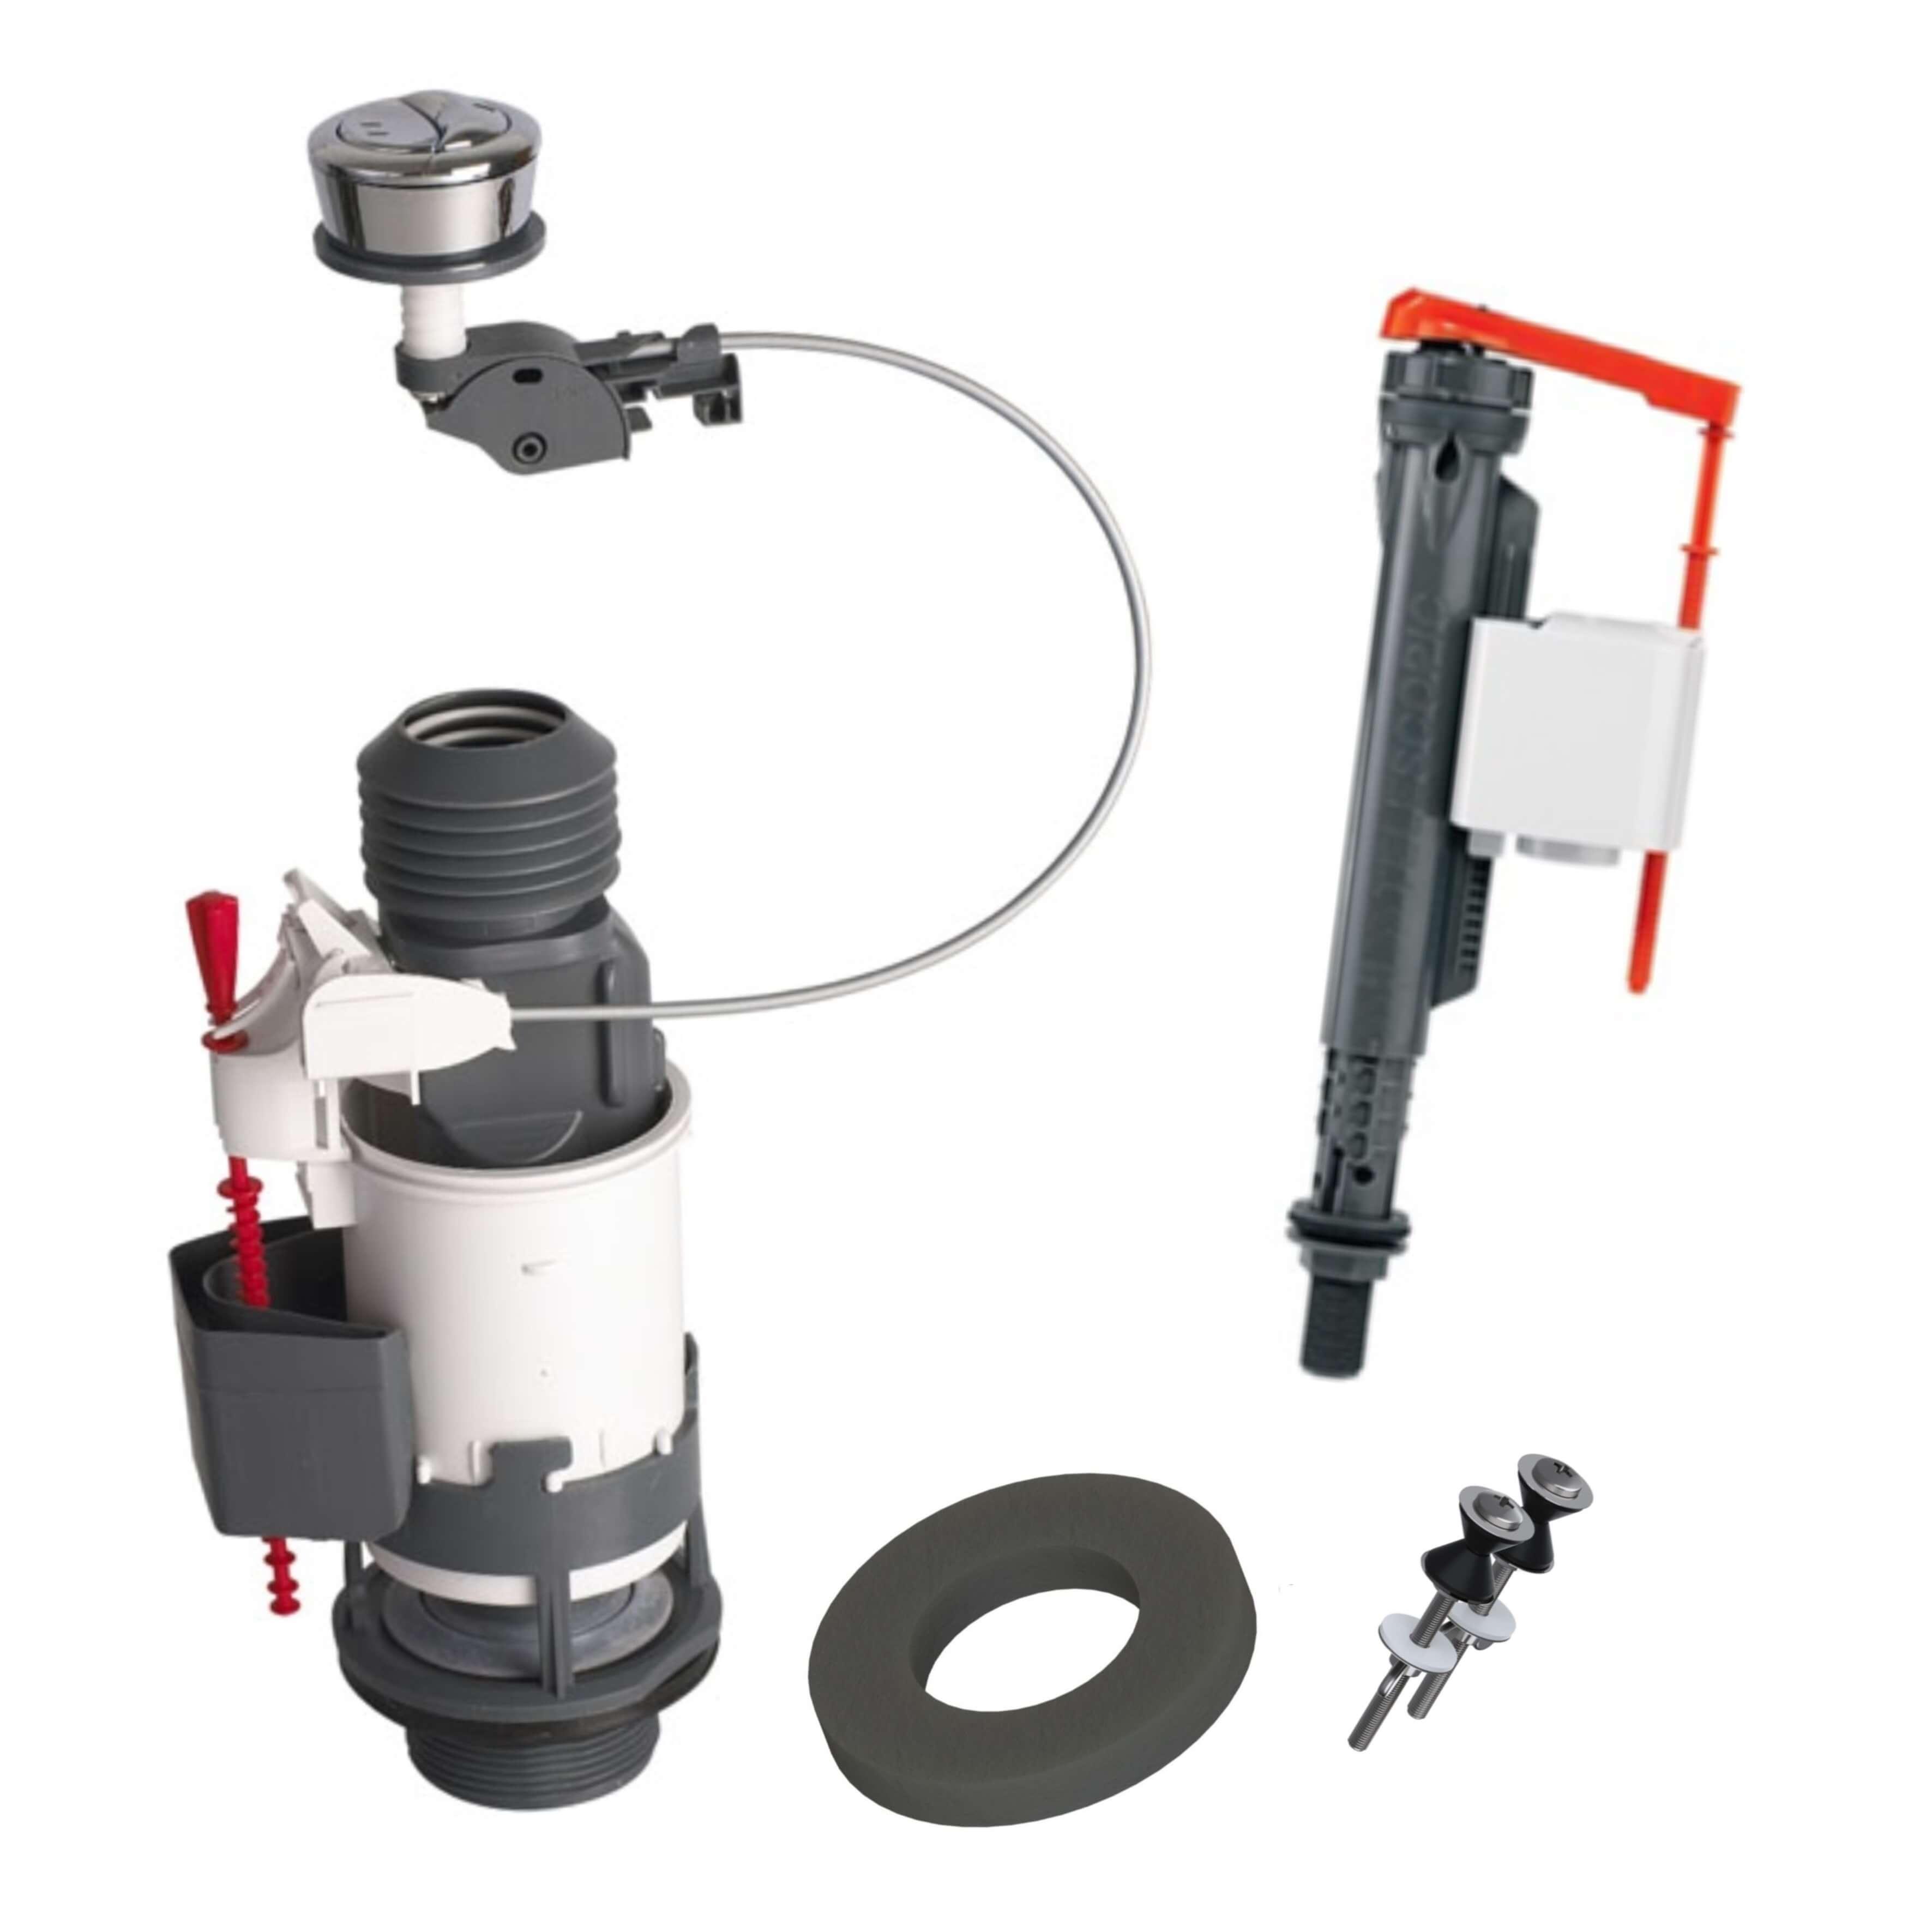 Jollyflush cistern kit 14020402